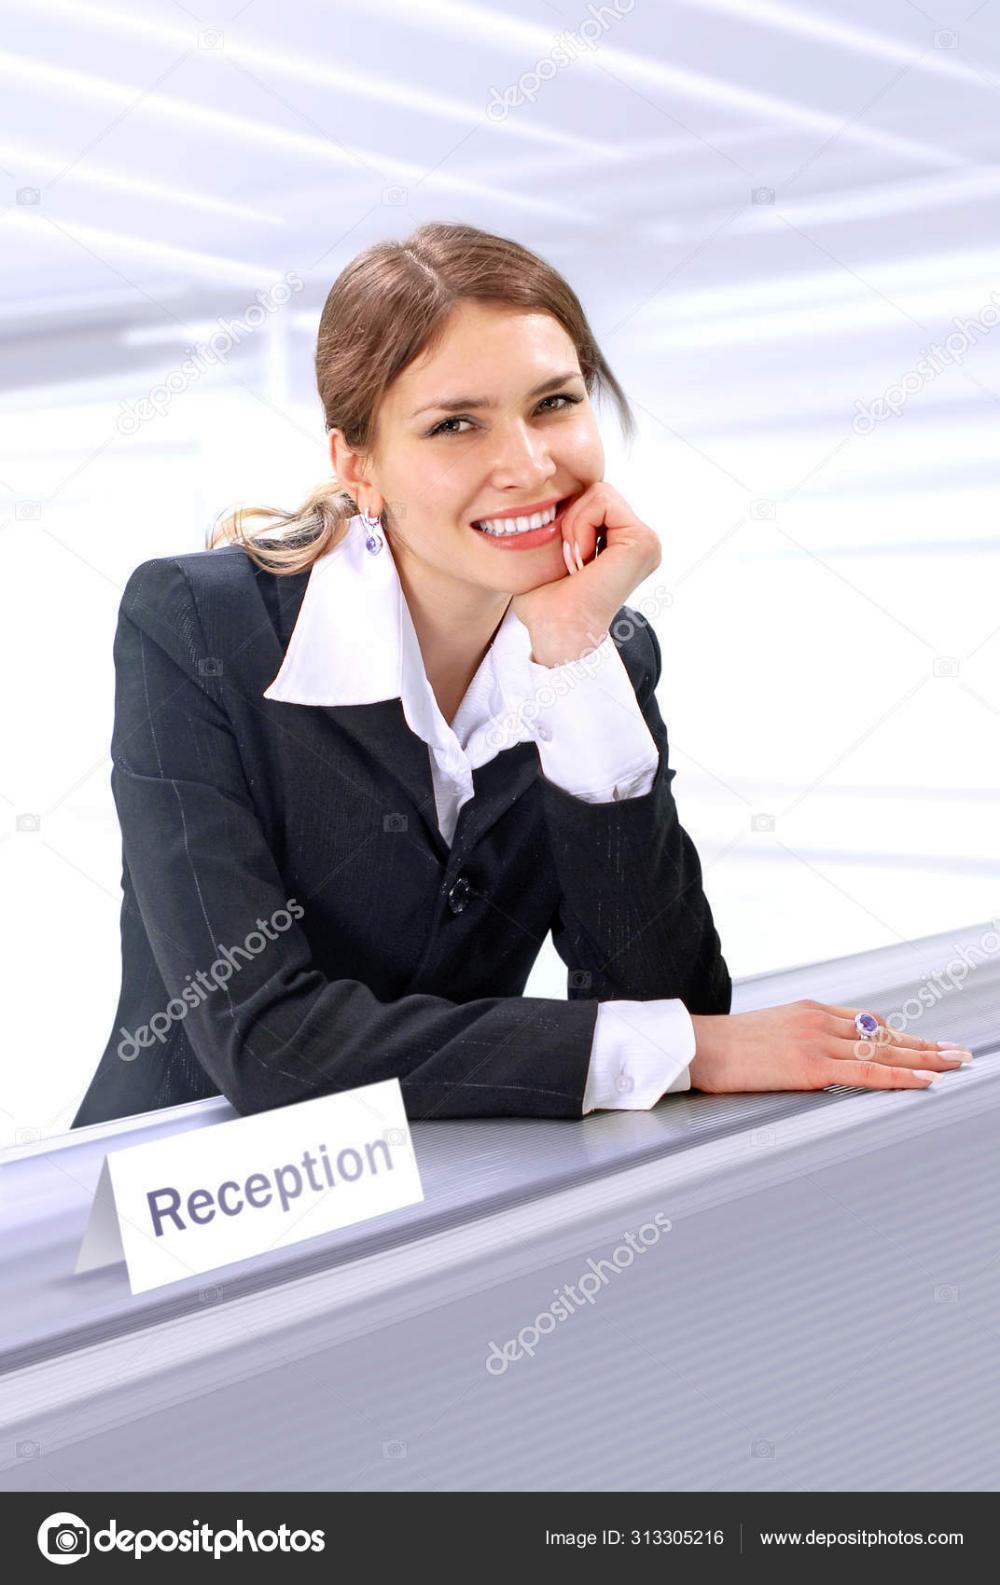 Download Beautiful reception clerk — Stock Image in 2020